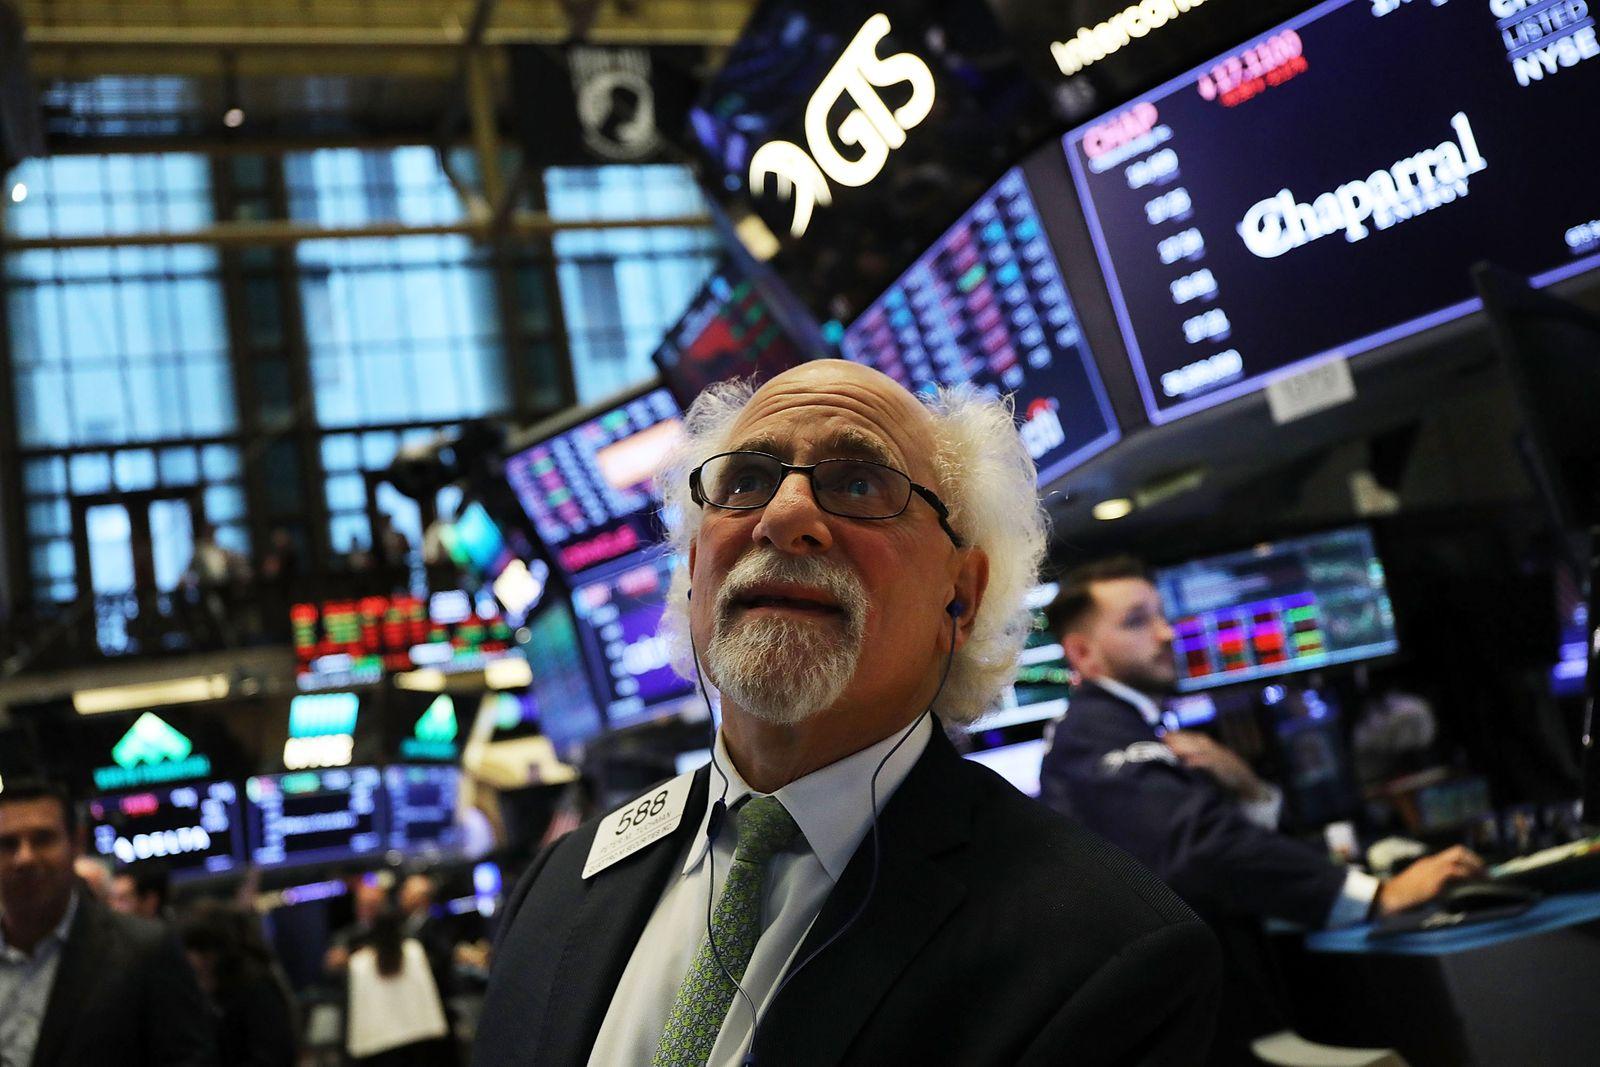 Verluste an der Wall Street / Börsencrash in New York / Börse